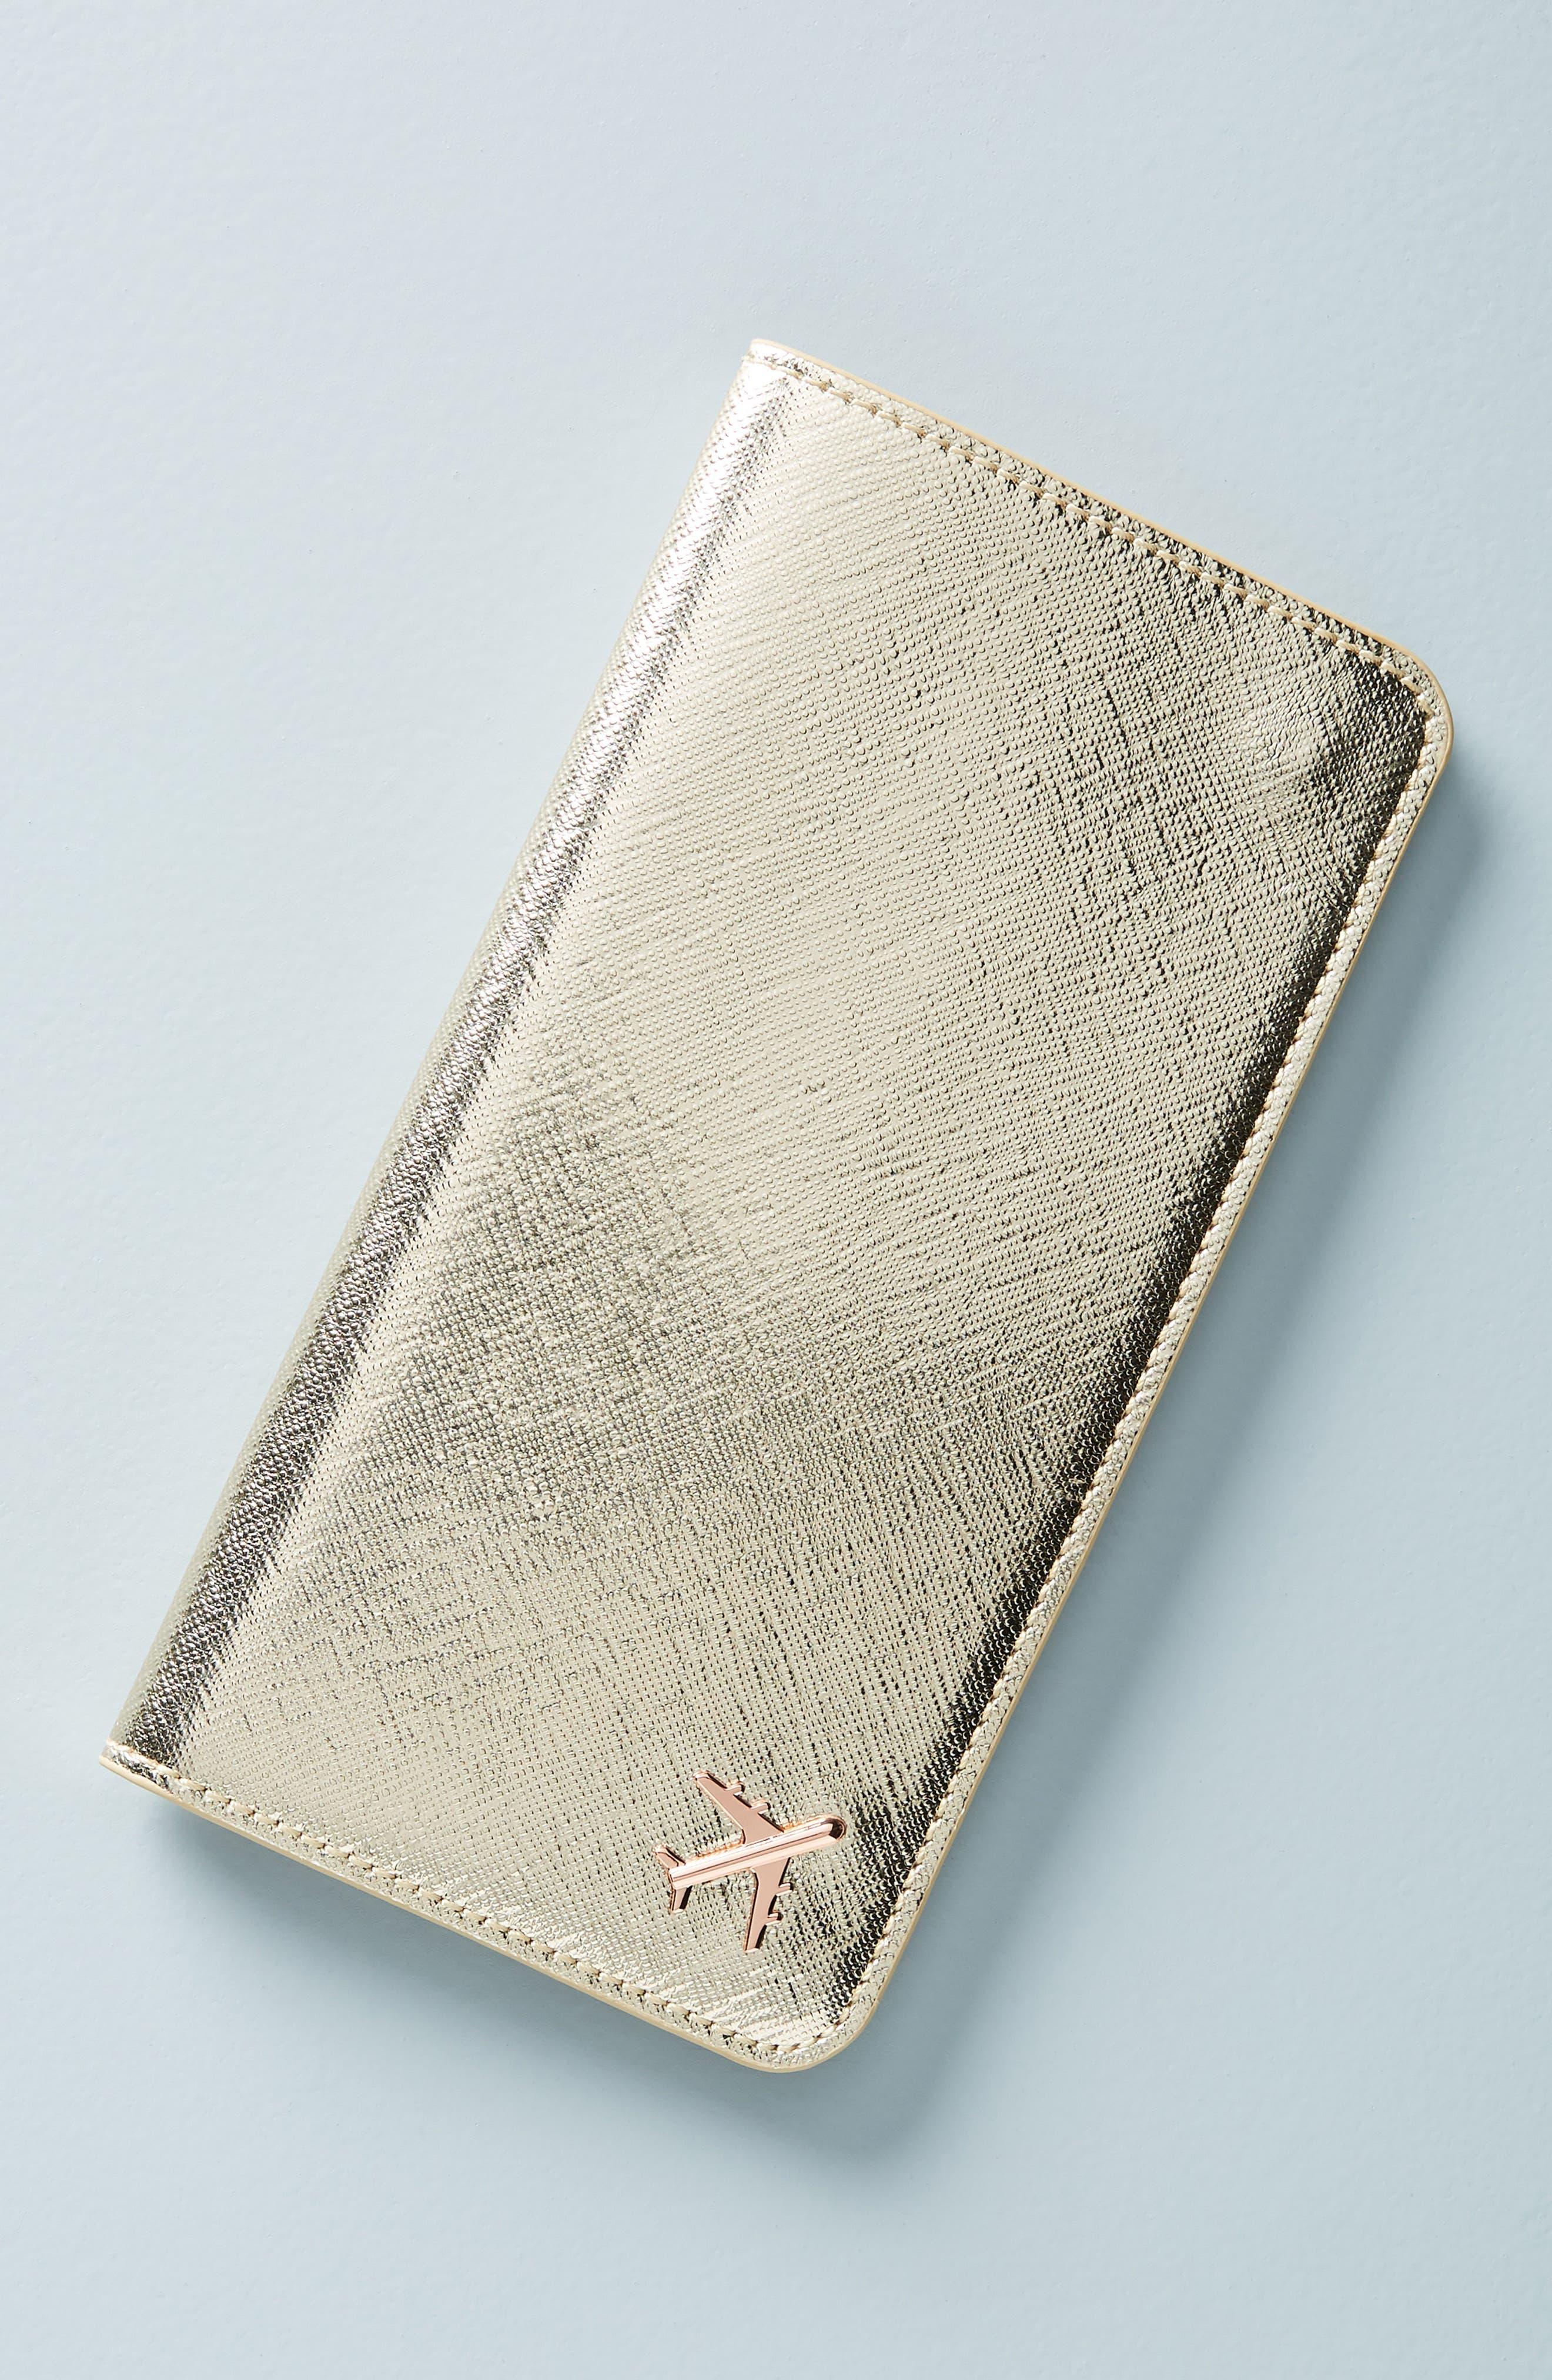 Celeste Travel Wallet,                         Main,                         color, 710